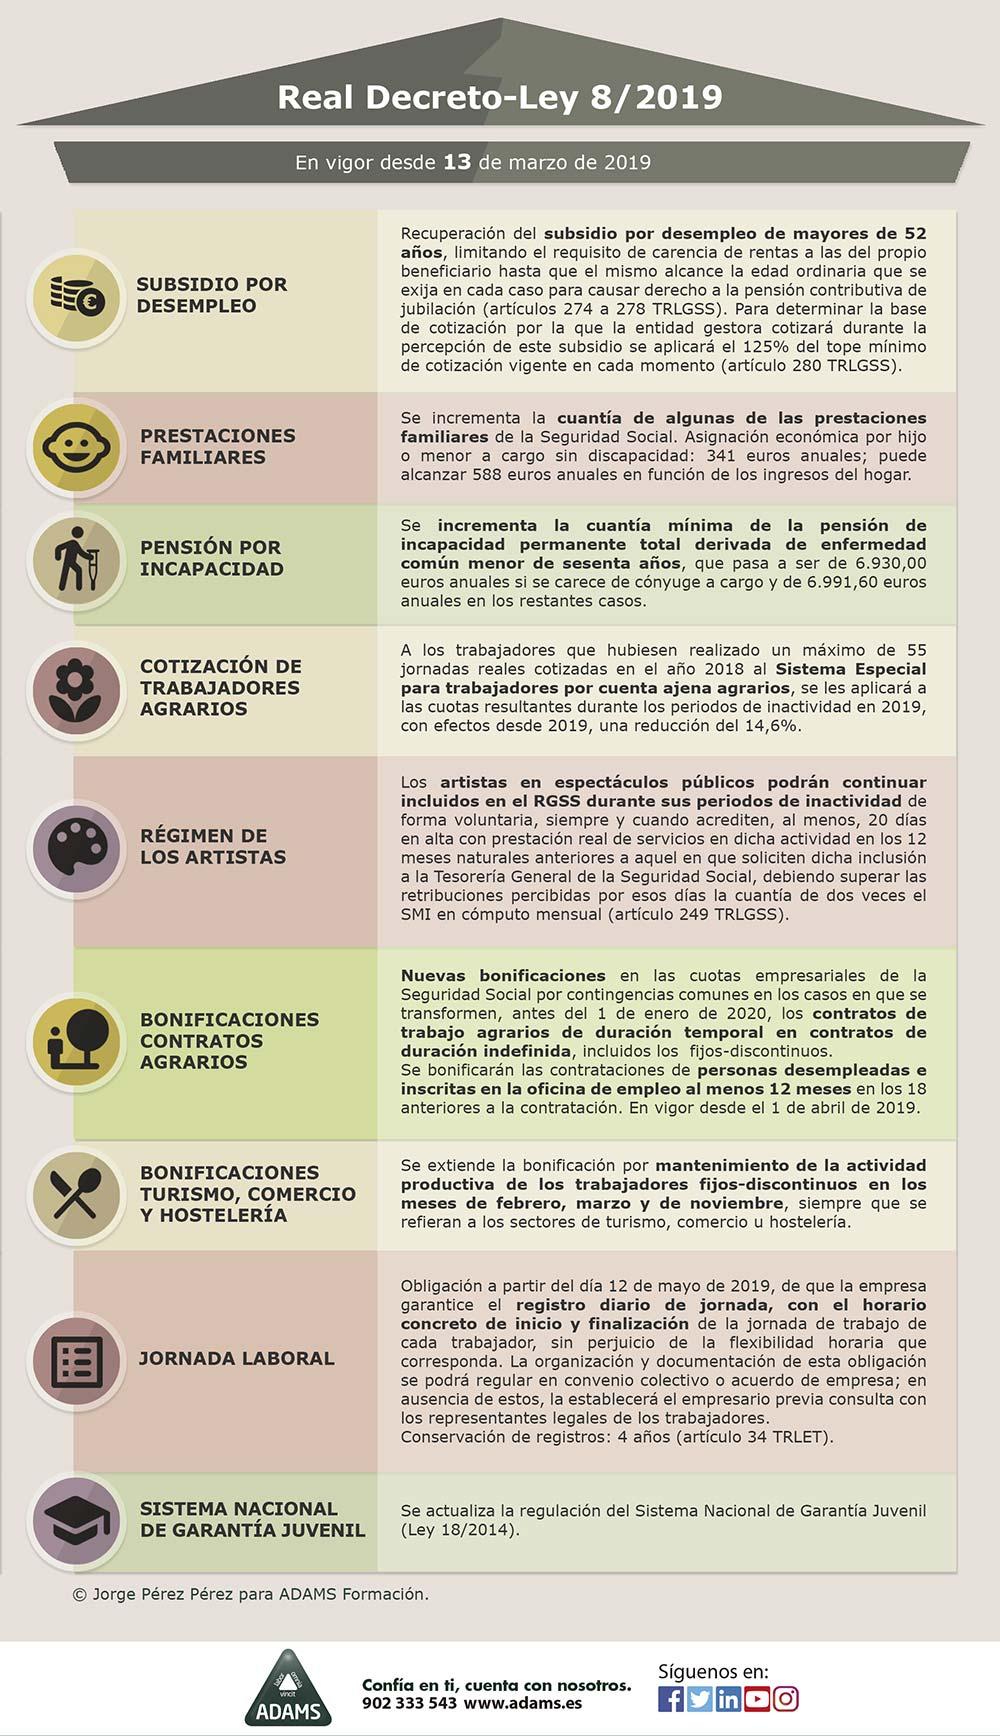 Real Decreto 8/2019